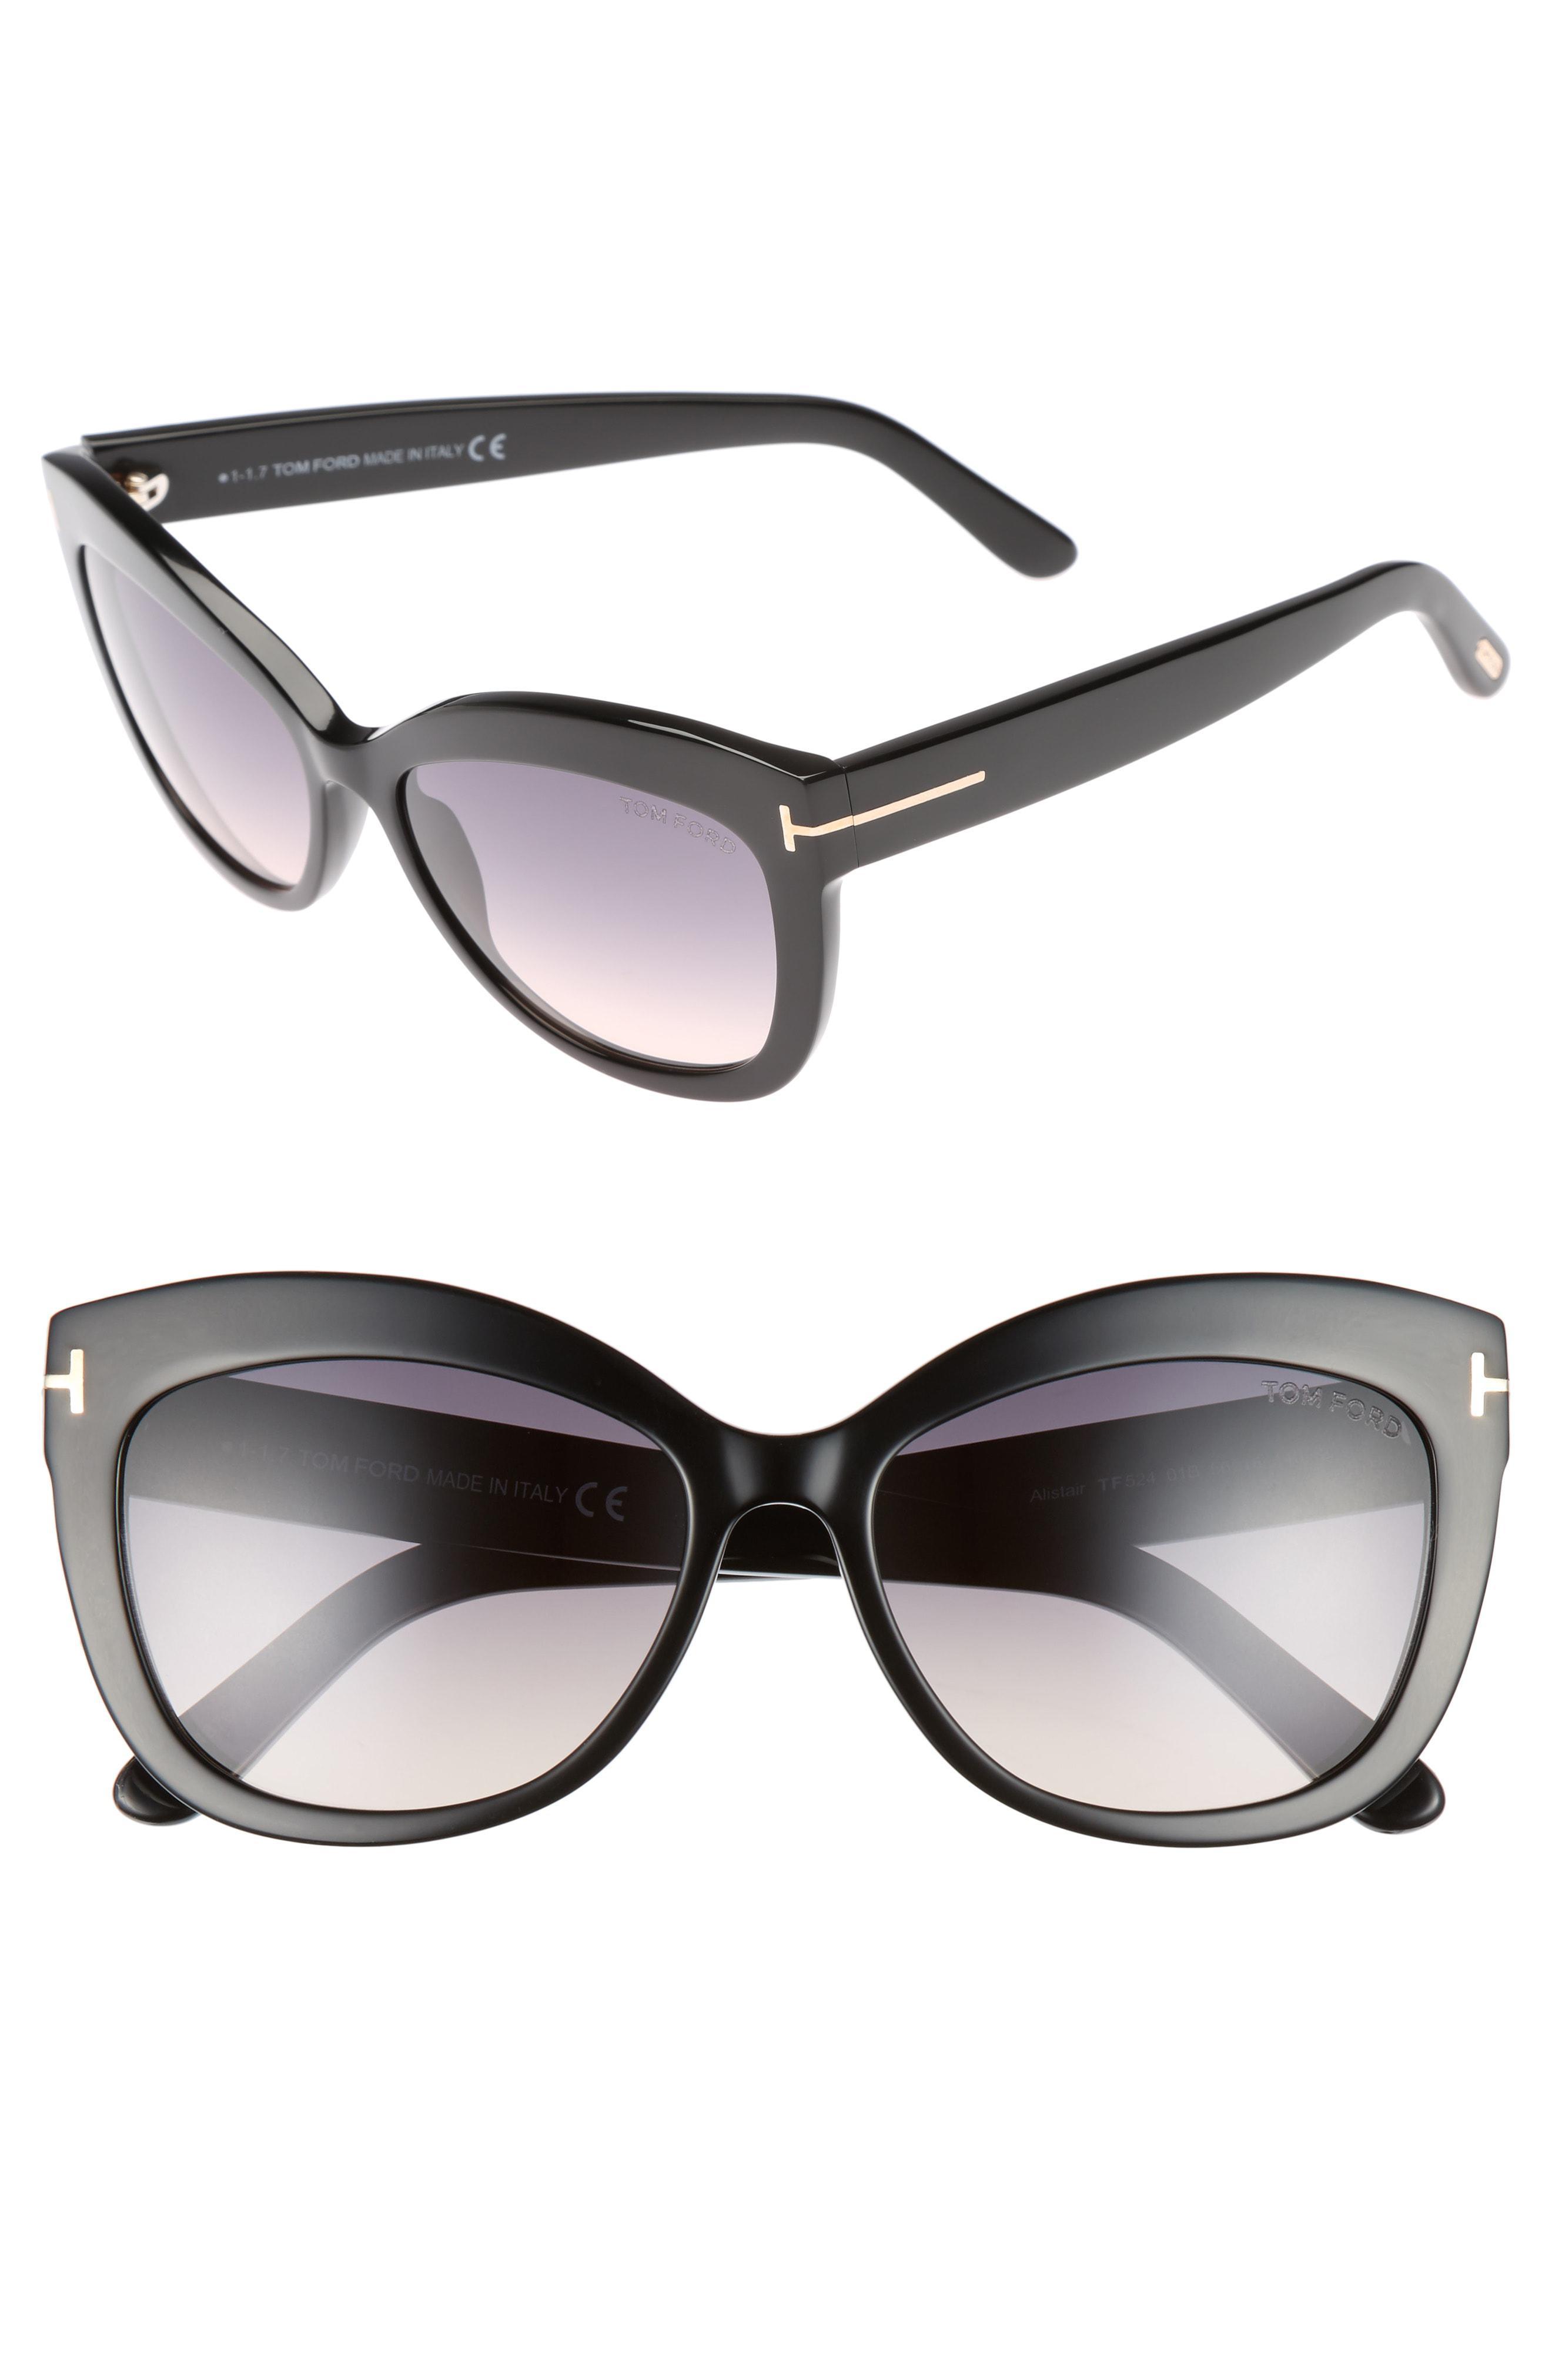 d8c59de2ffd0 Tom Ford. Women s Alistair 56mm Gradient Sunglasses - Shiny Black   Gradient  Smoke